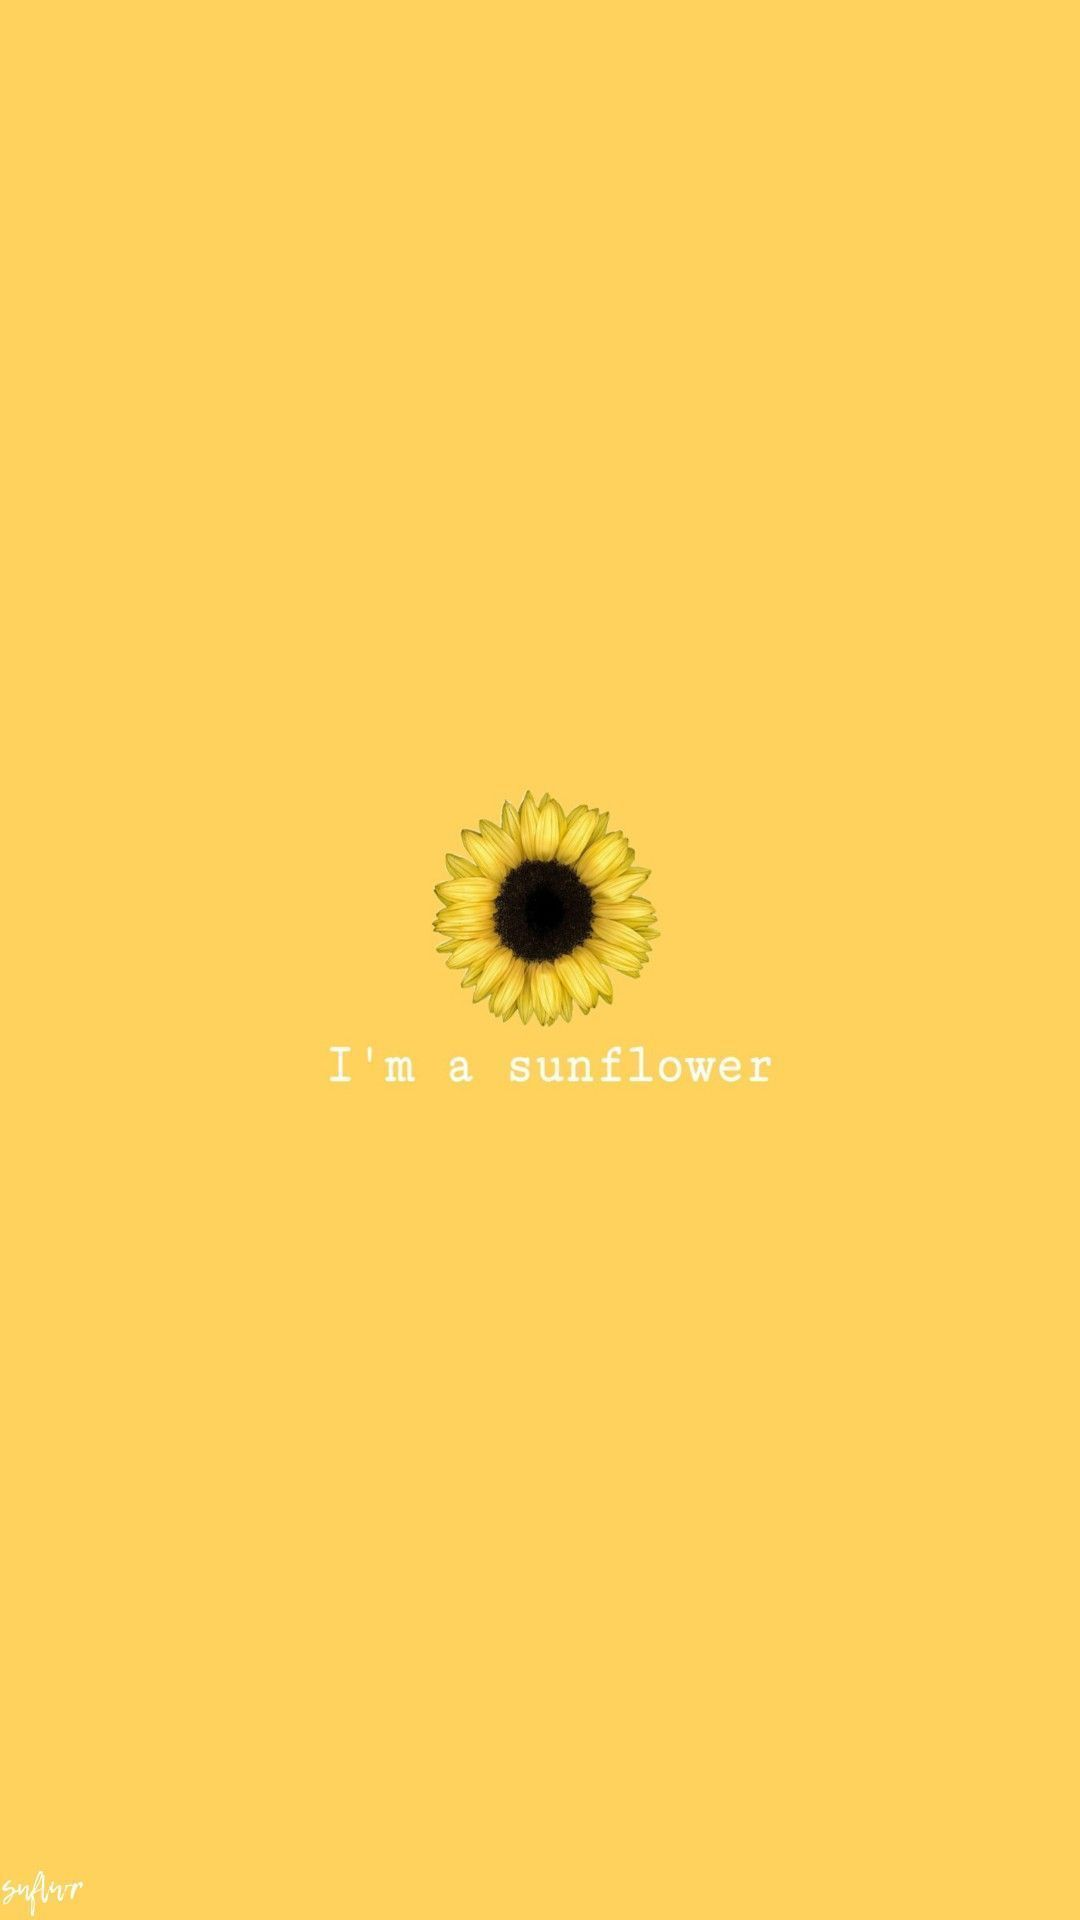 Girasole Yellowastheticwallpaperiphone Sunflowerwallpaper Girasole Sunflower Wallpaper Yellow Wallpaper Sunflower Iphone Wallpaper